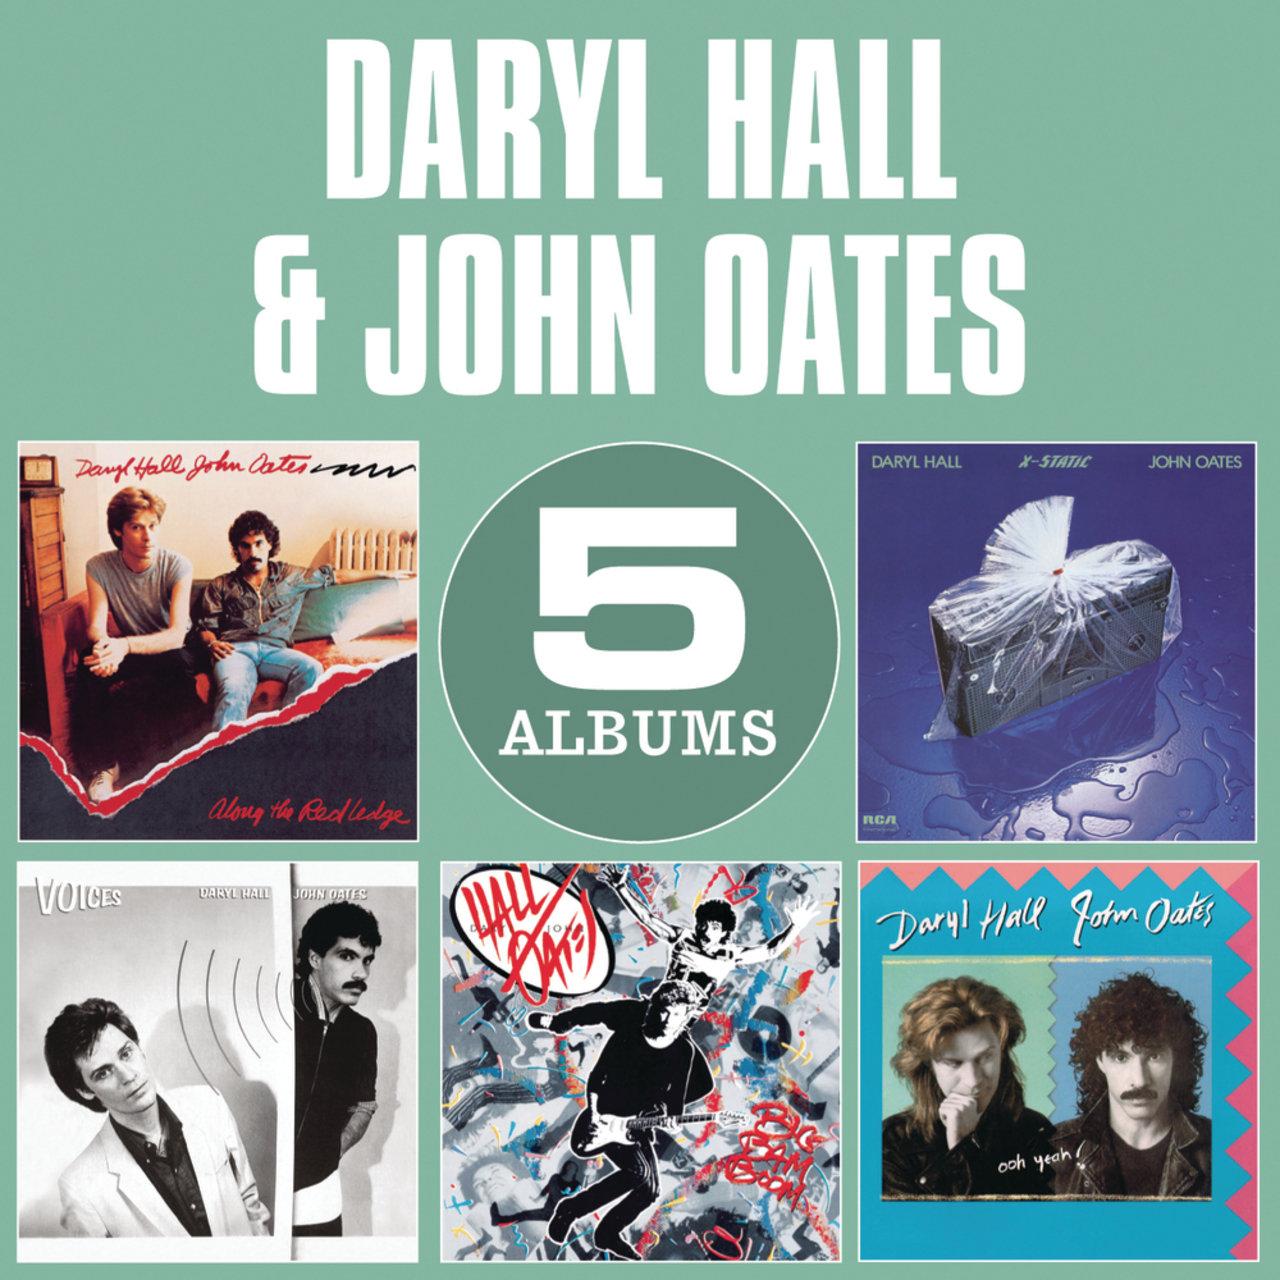 H2o Remastered Bonus Track Version Daryl Hall John Oates: TIDAL: Listen To Legends Live In Concert, Volume 43 On TIDAL